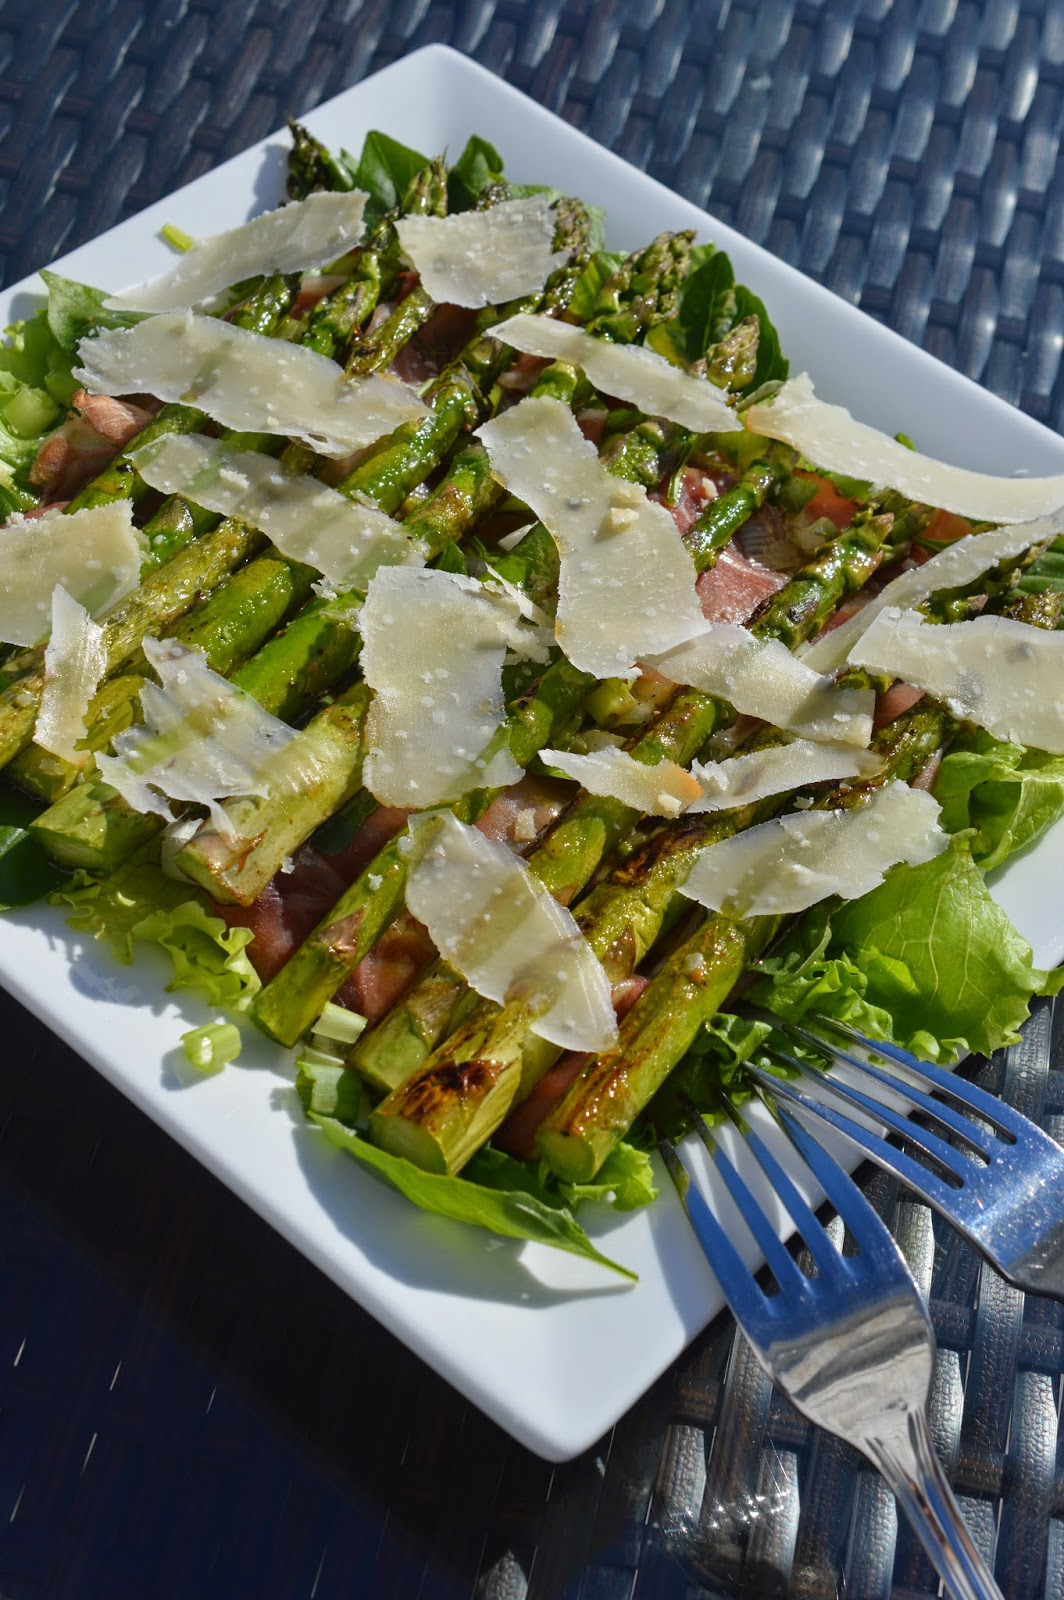 Lili popotte salade d 39 asperge et de proscuitto - Accompagnement homard grille ...